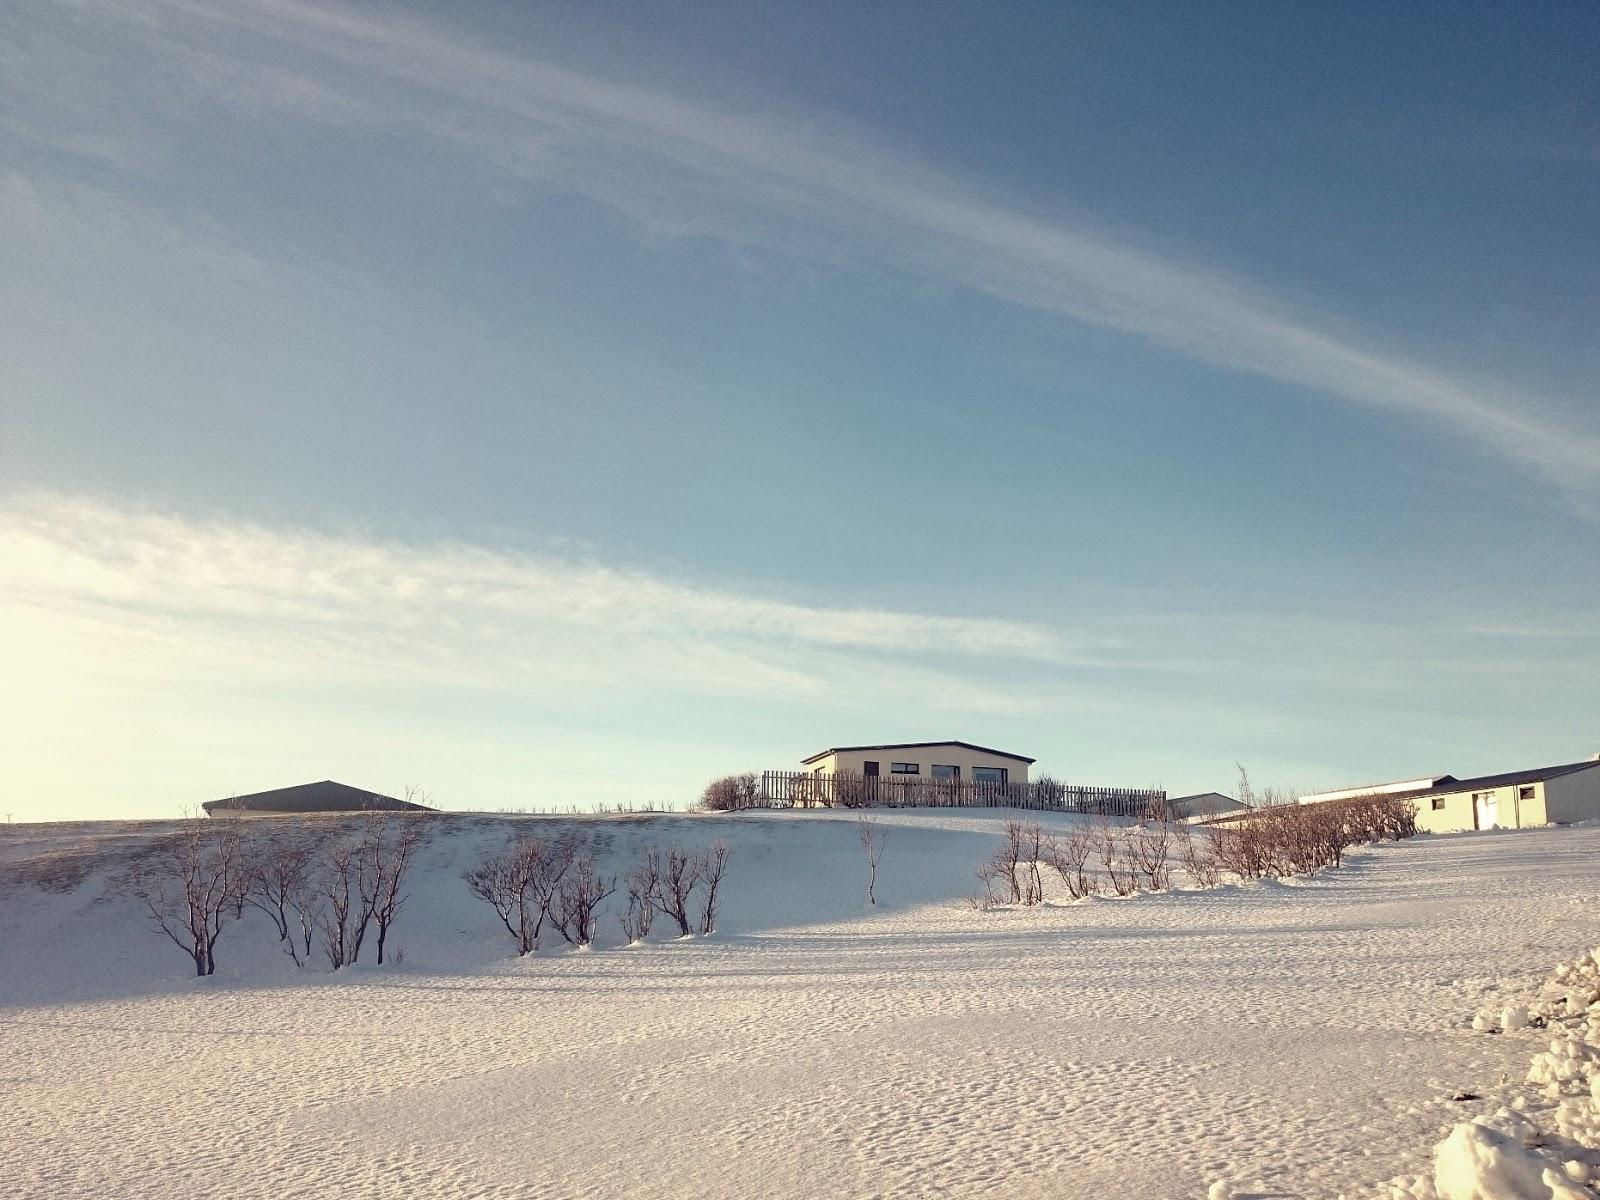 Pogoda islandzka, Islandia, Pani Dorcia, blog o Islandii, zima w Islandii